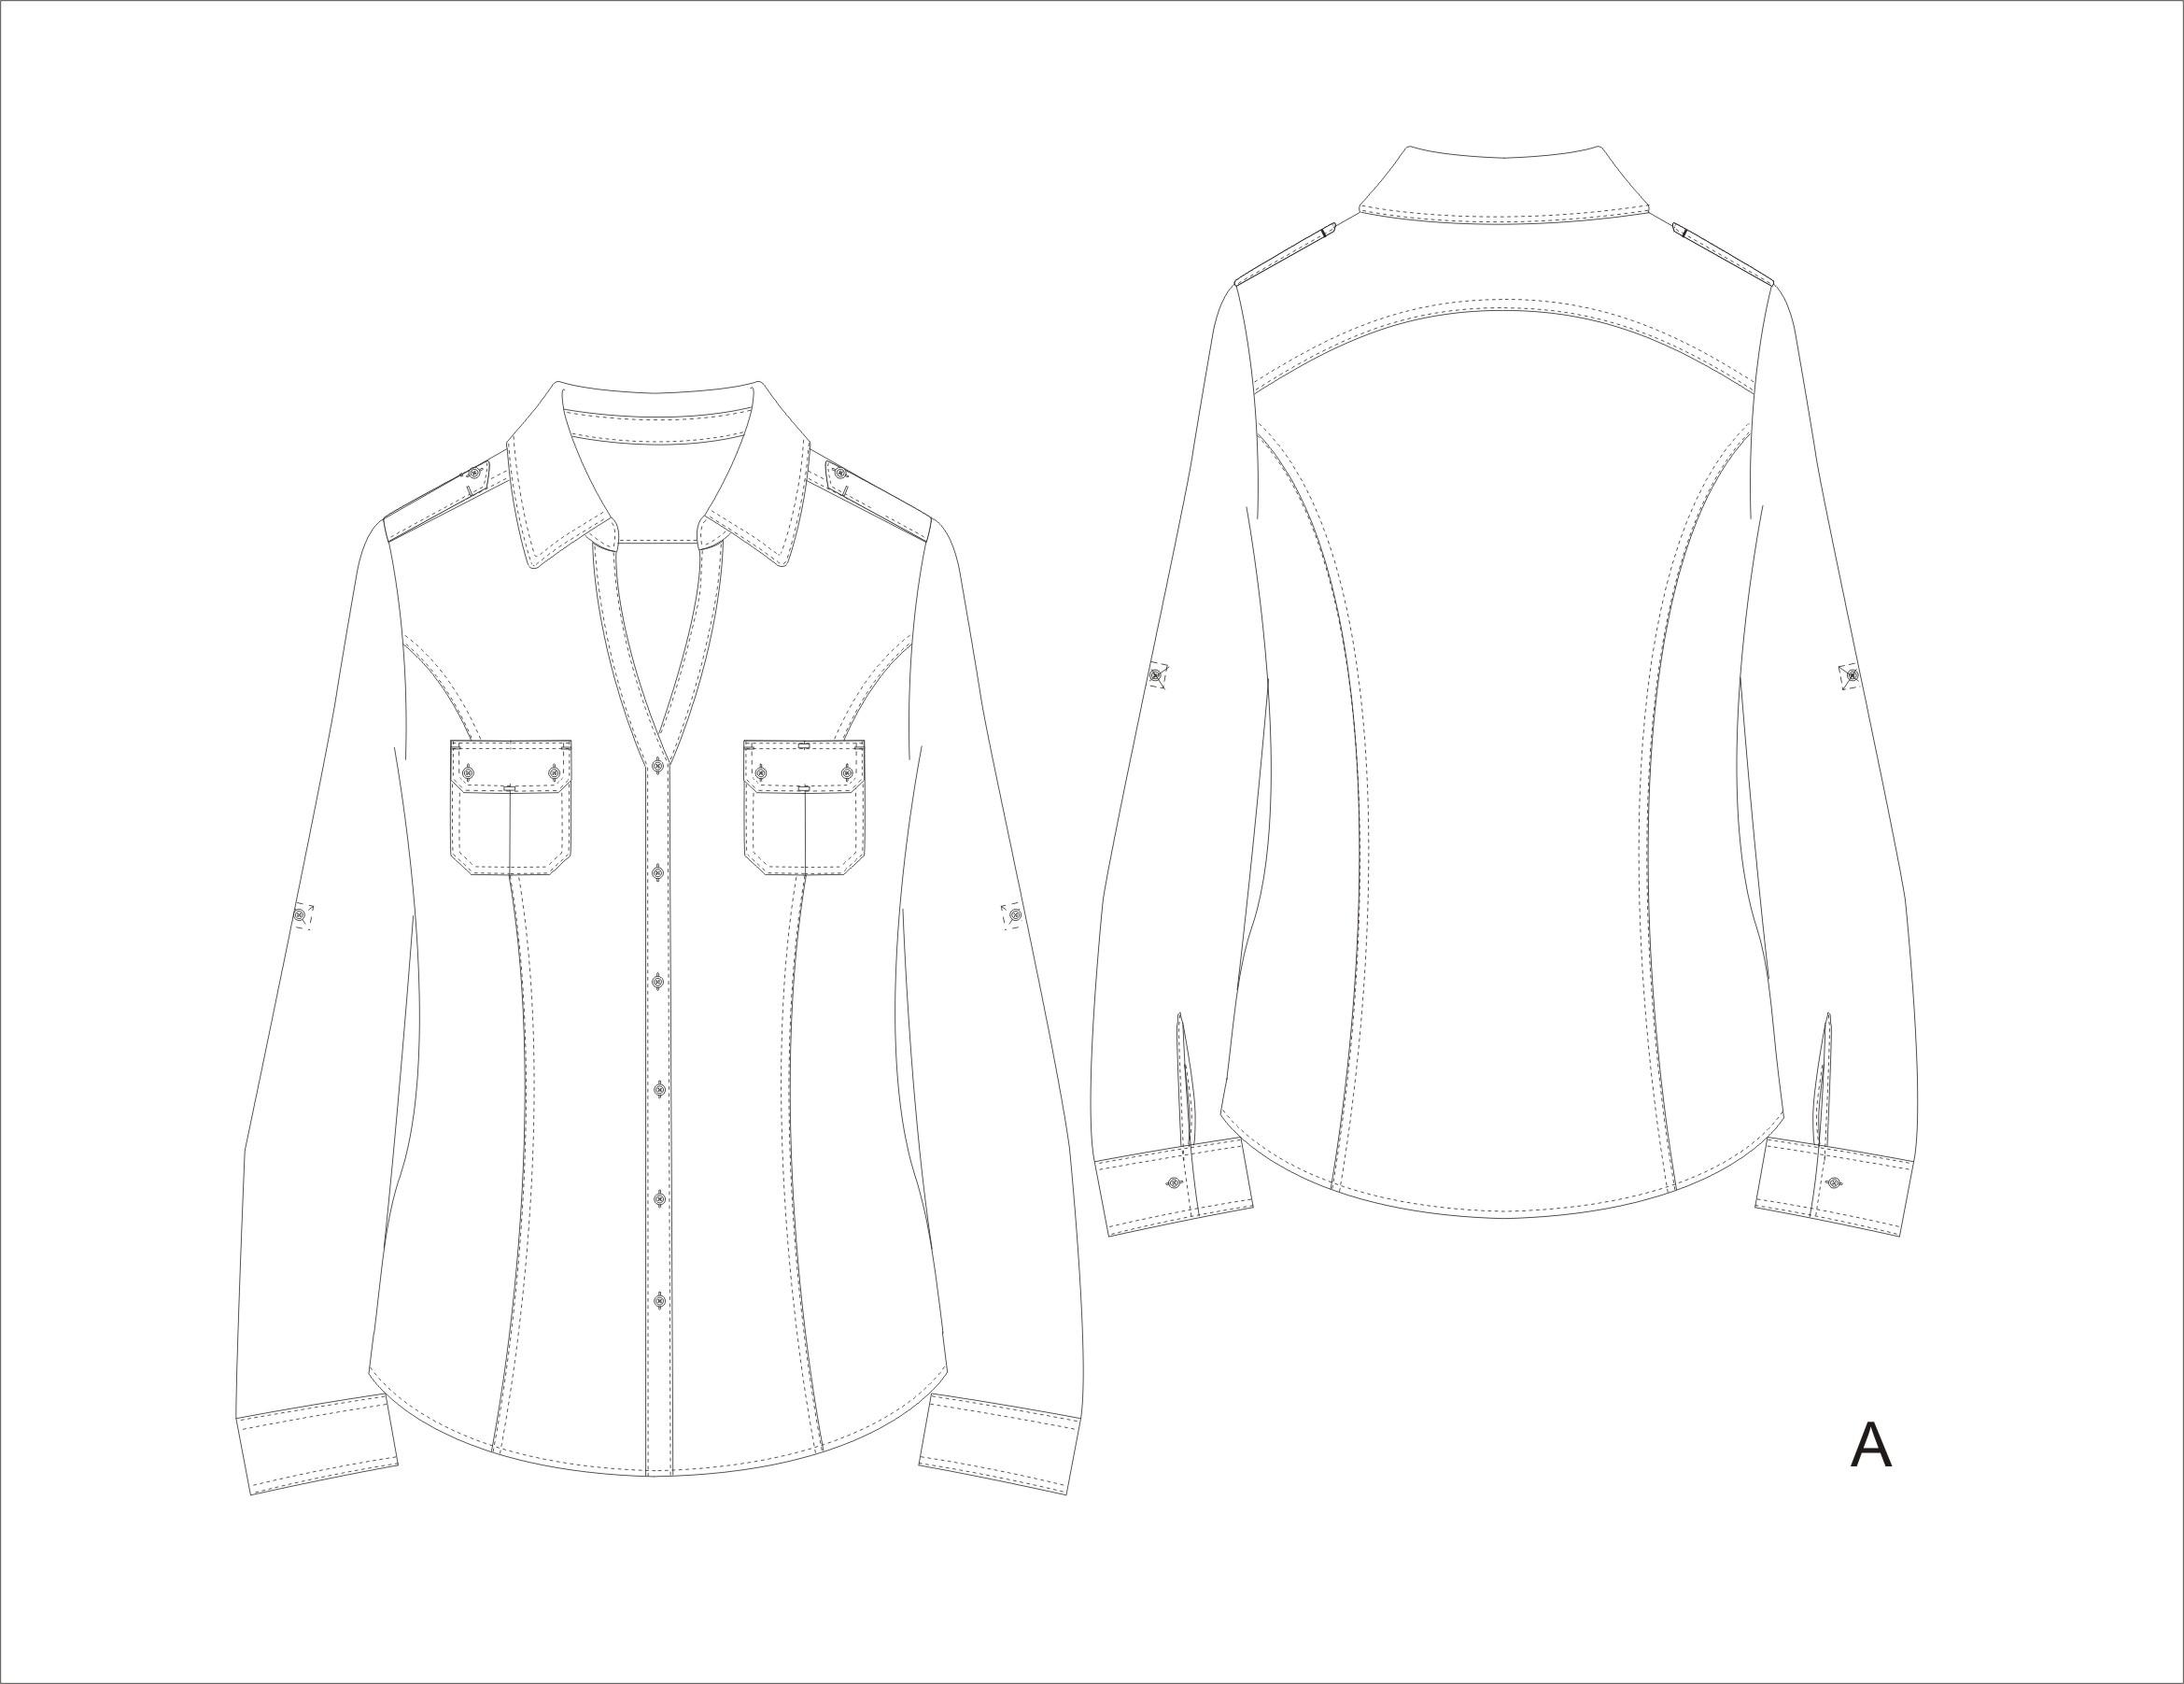 Shirt design sketches - H Favorite